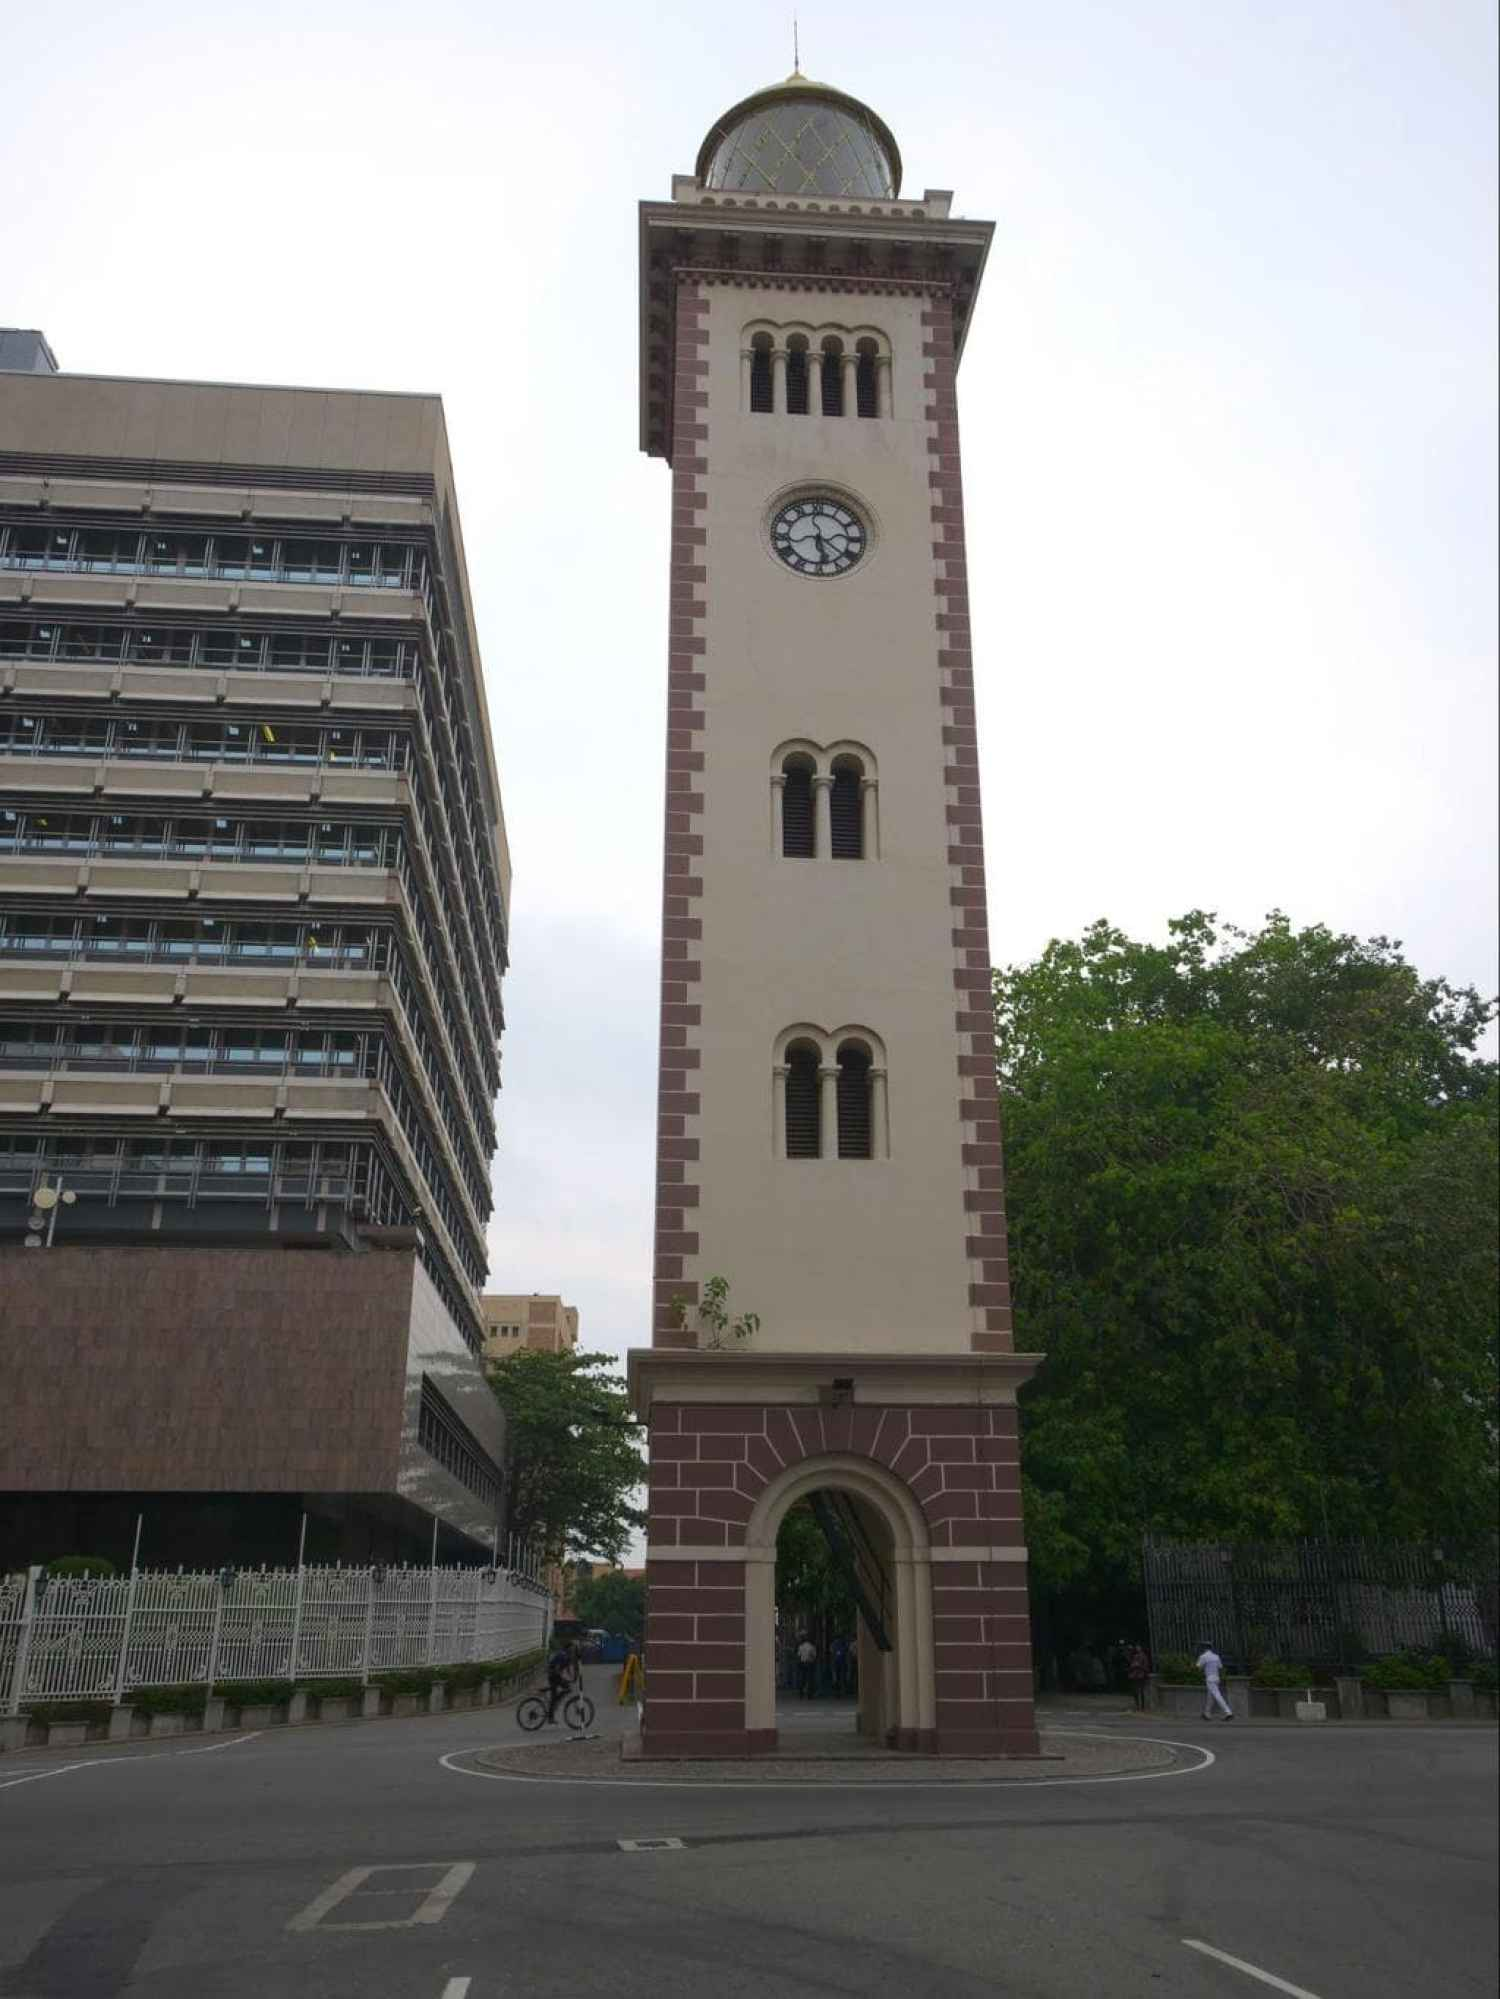 Lighthouse Clock Tower